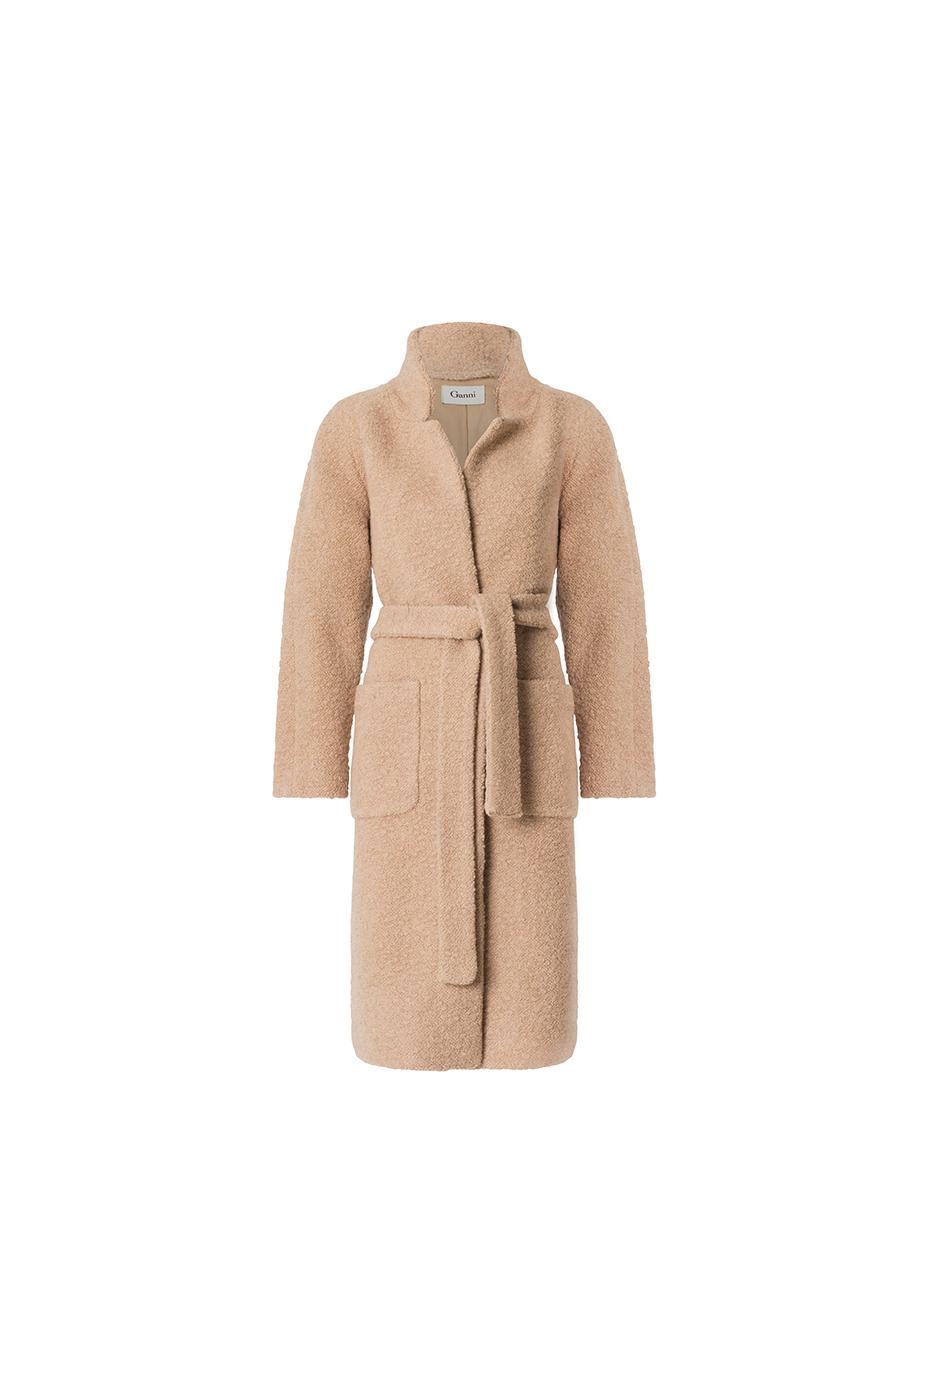 Coats & Jackets > Wrap coat